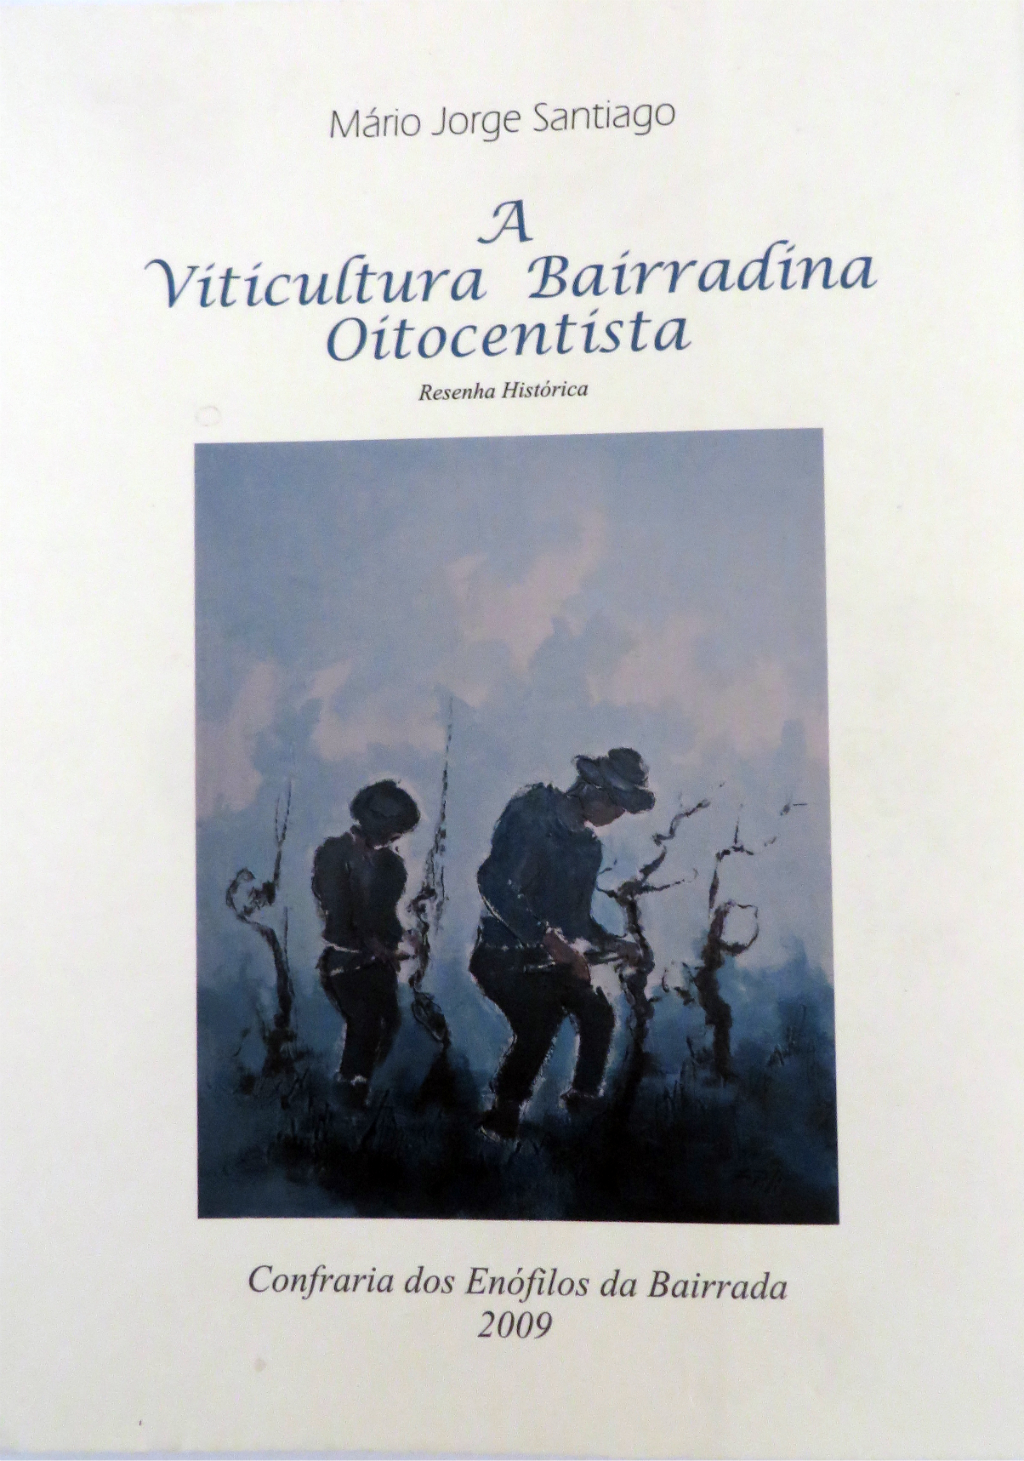 A Viticultura Bairradina Oitocentista